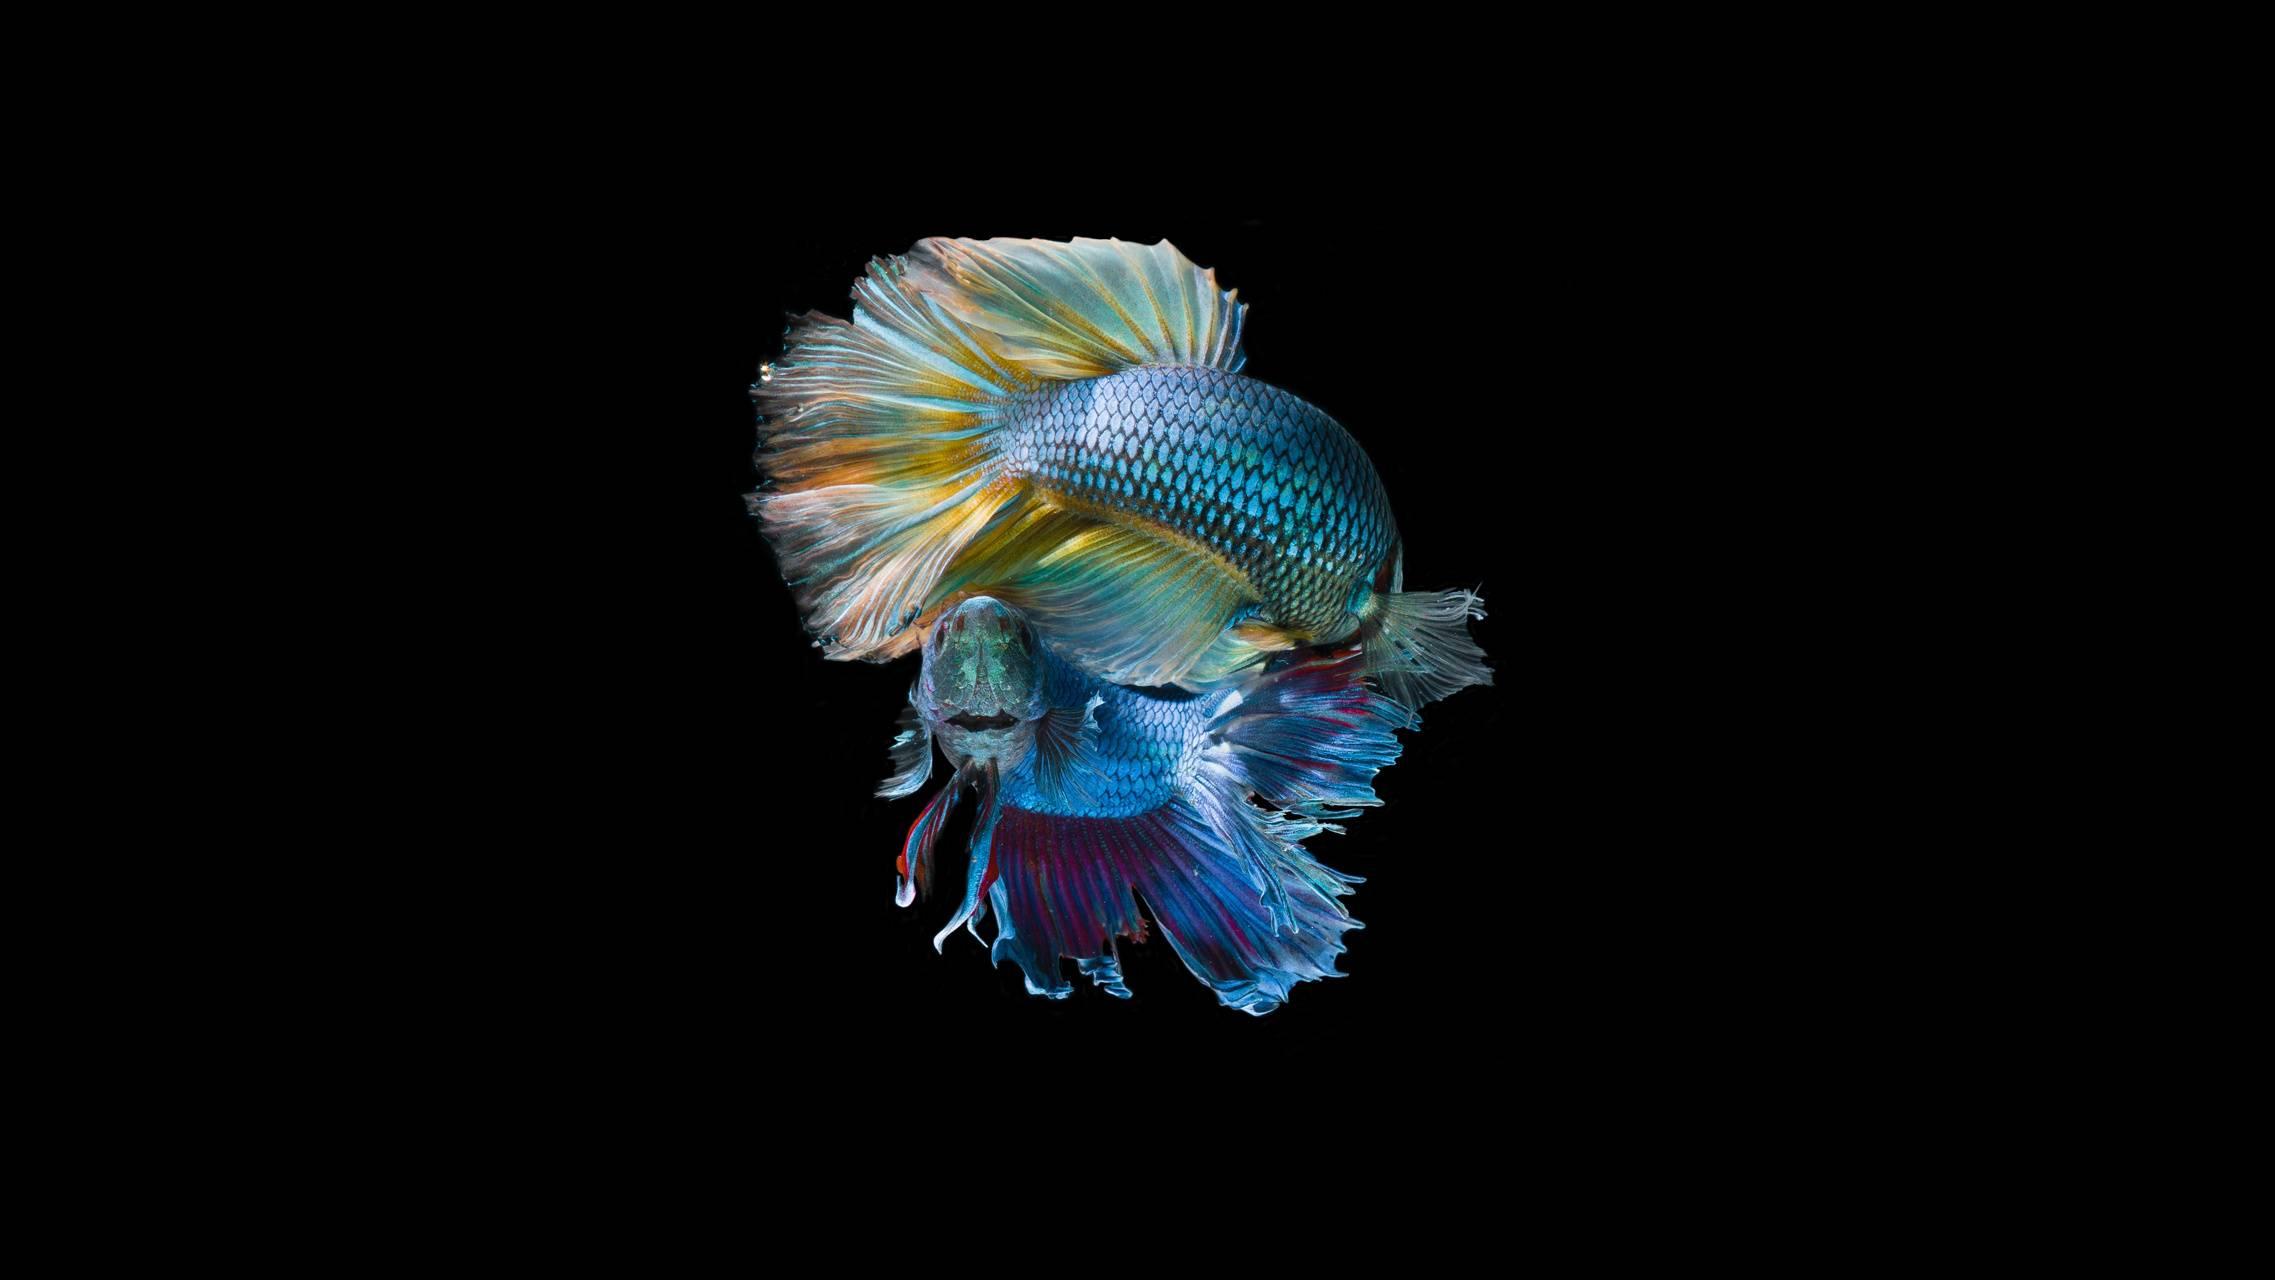 Fish hd